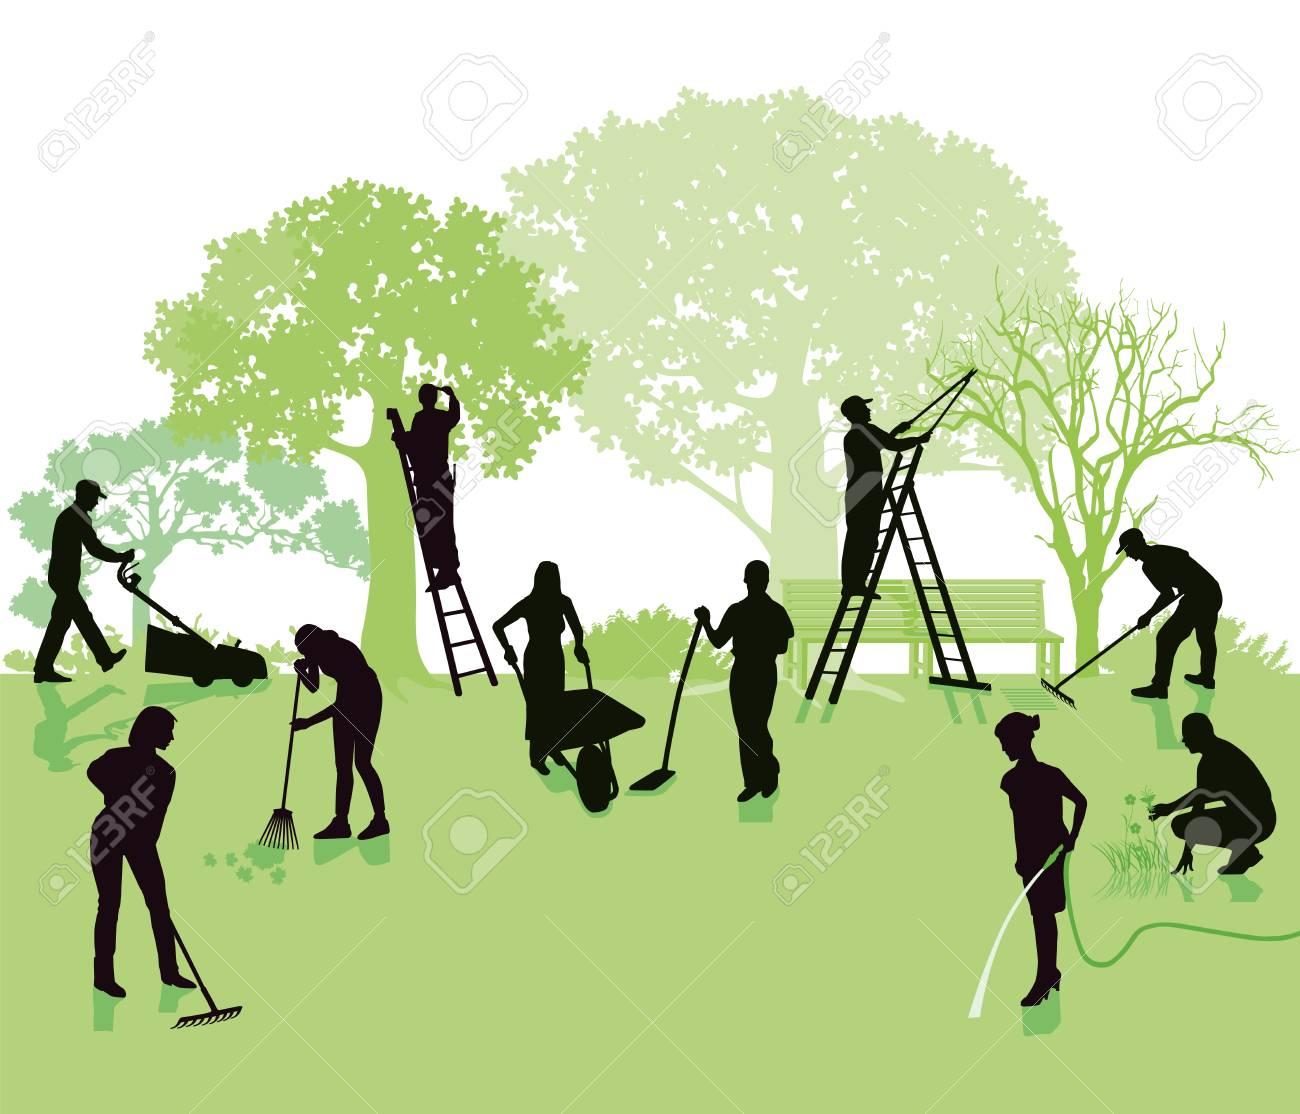 Gardening, garden with gardeners - 88856332